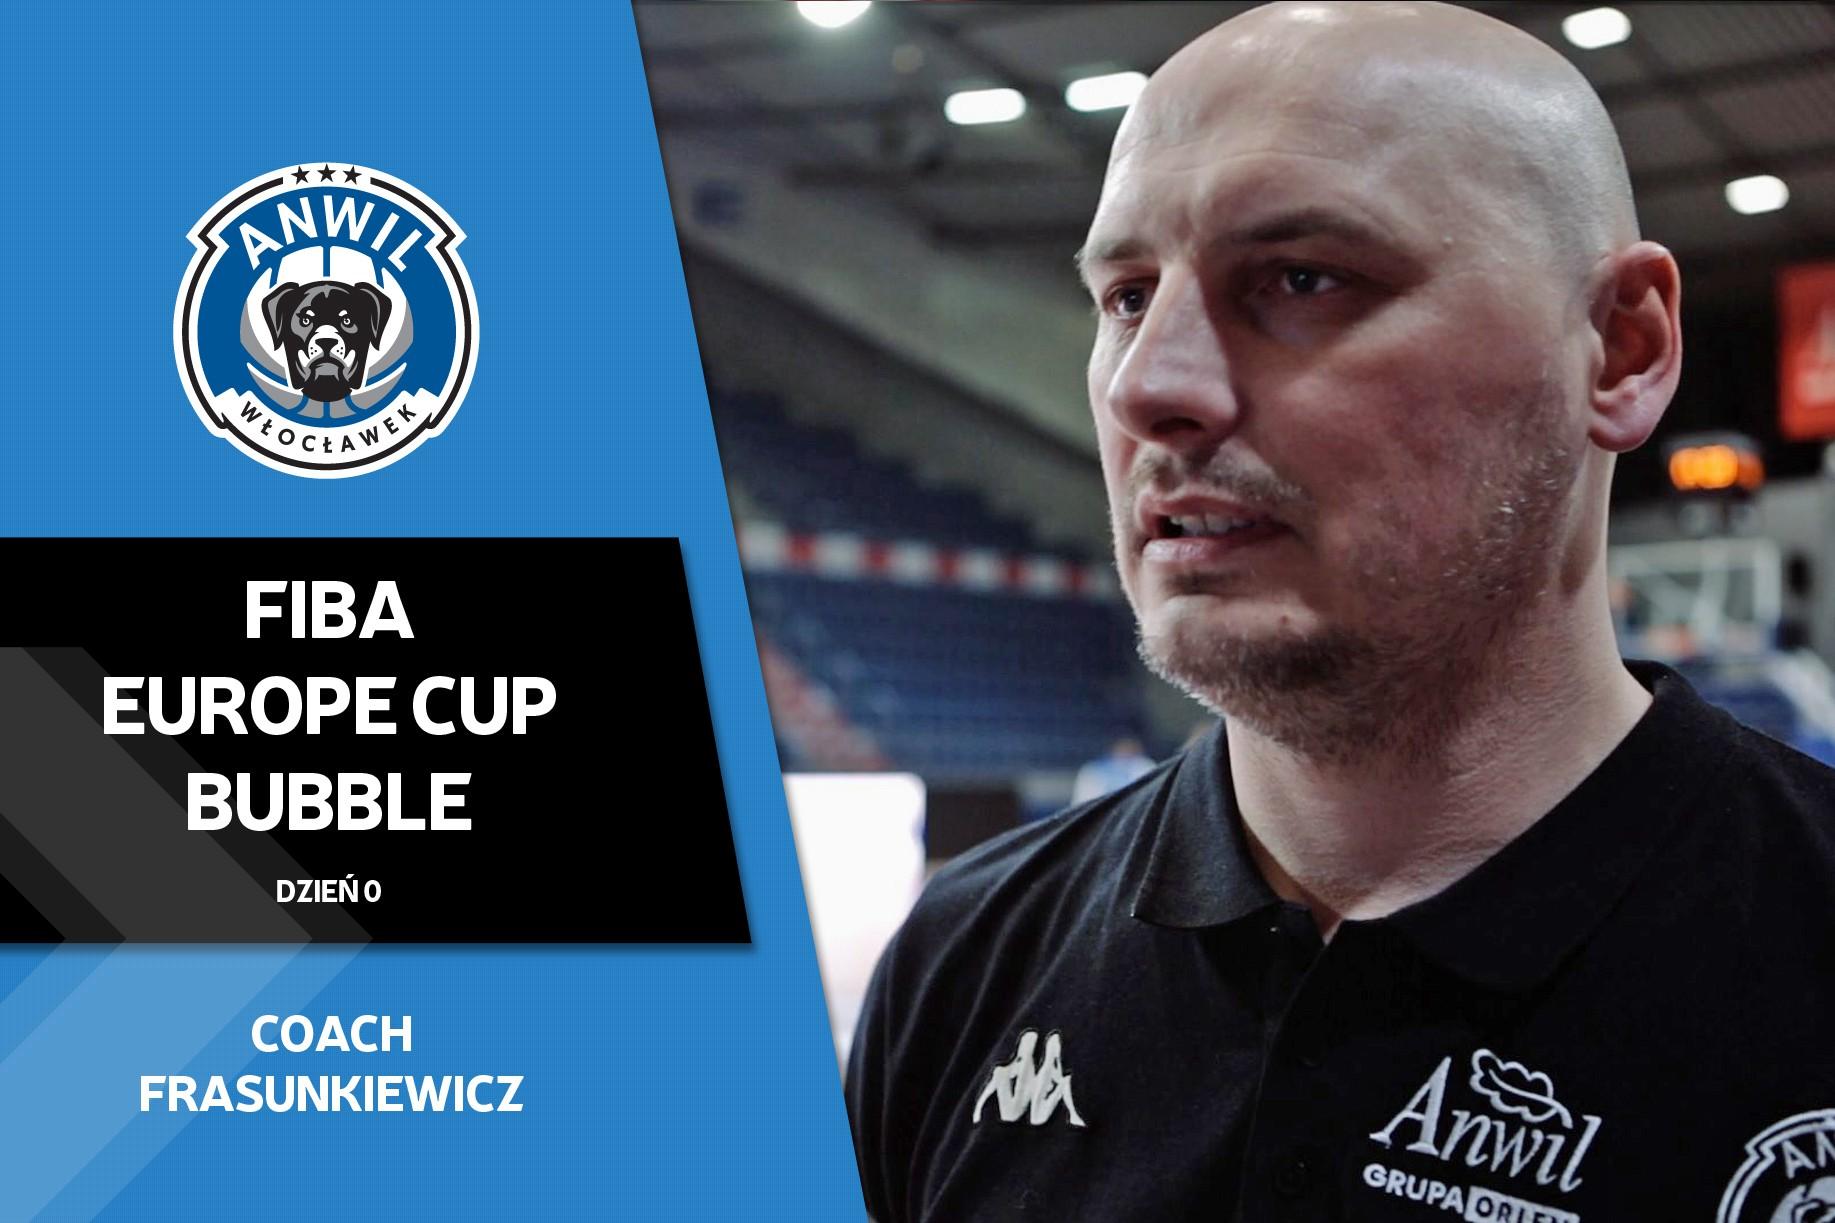 WIDEO | FIBA Europe Cup | Dzień 0